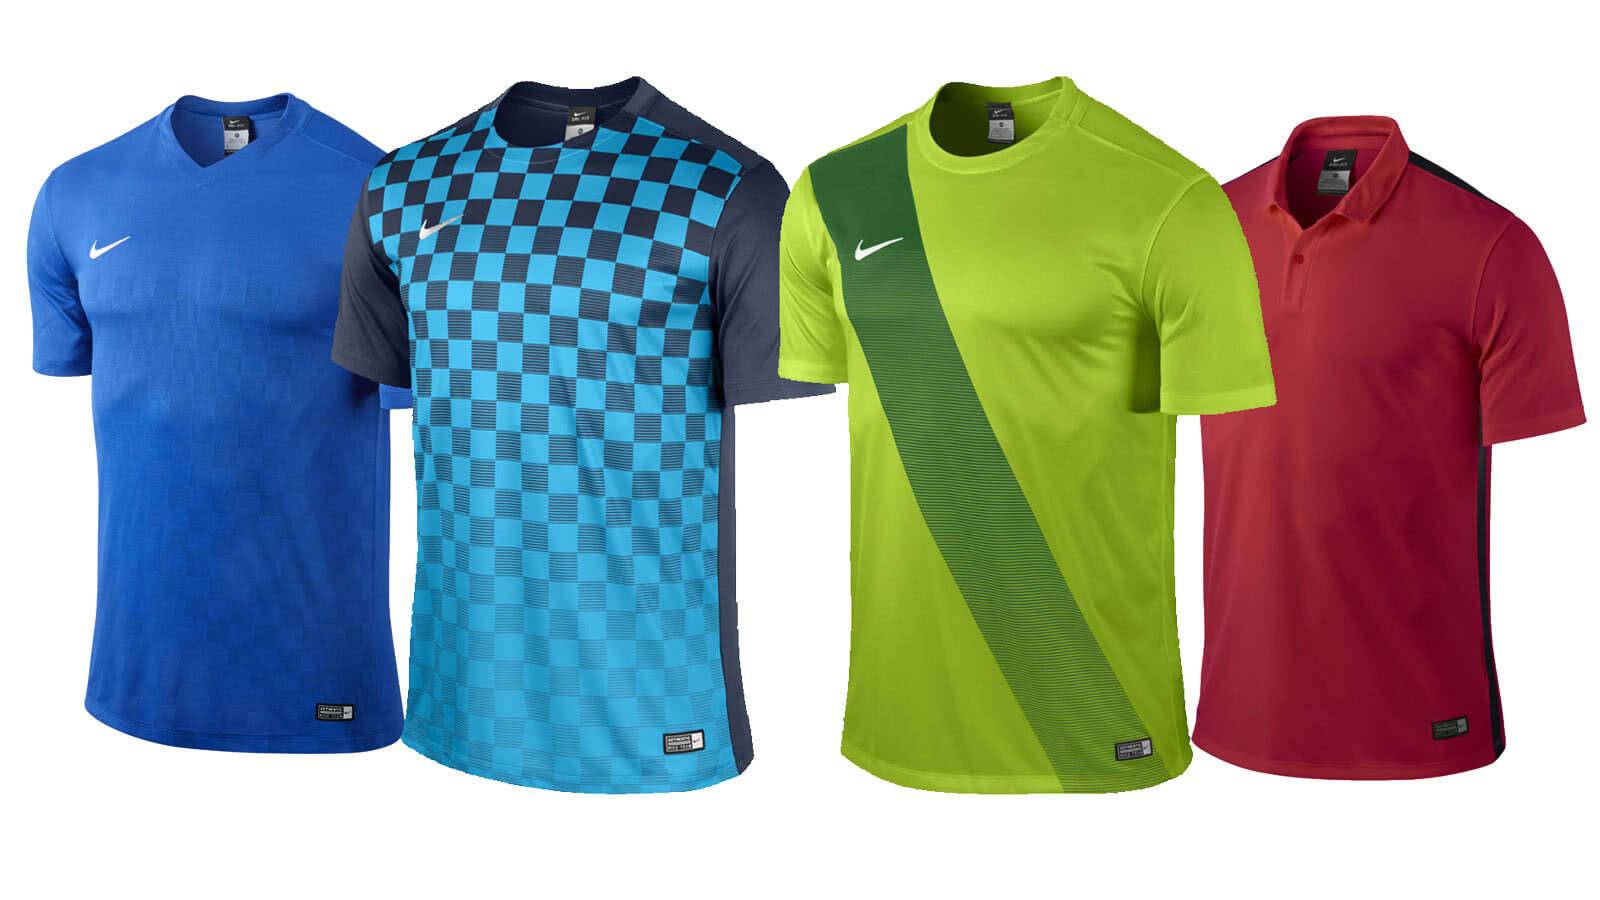 Nike Trikots kaufen